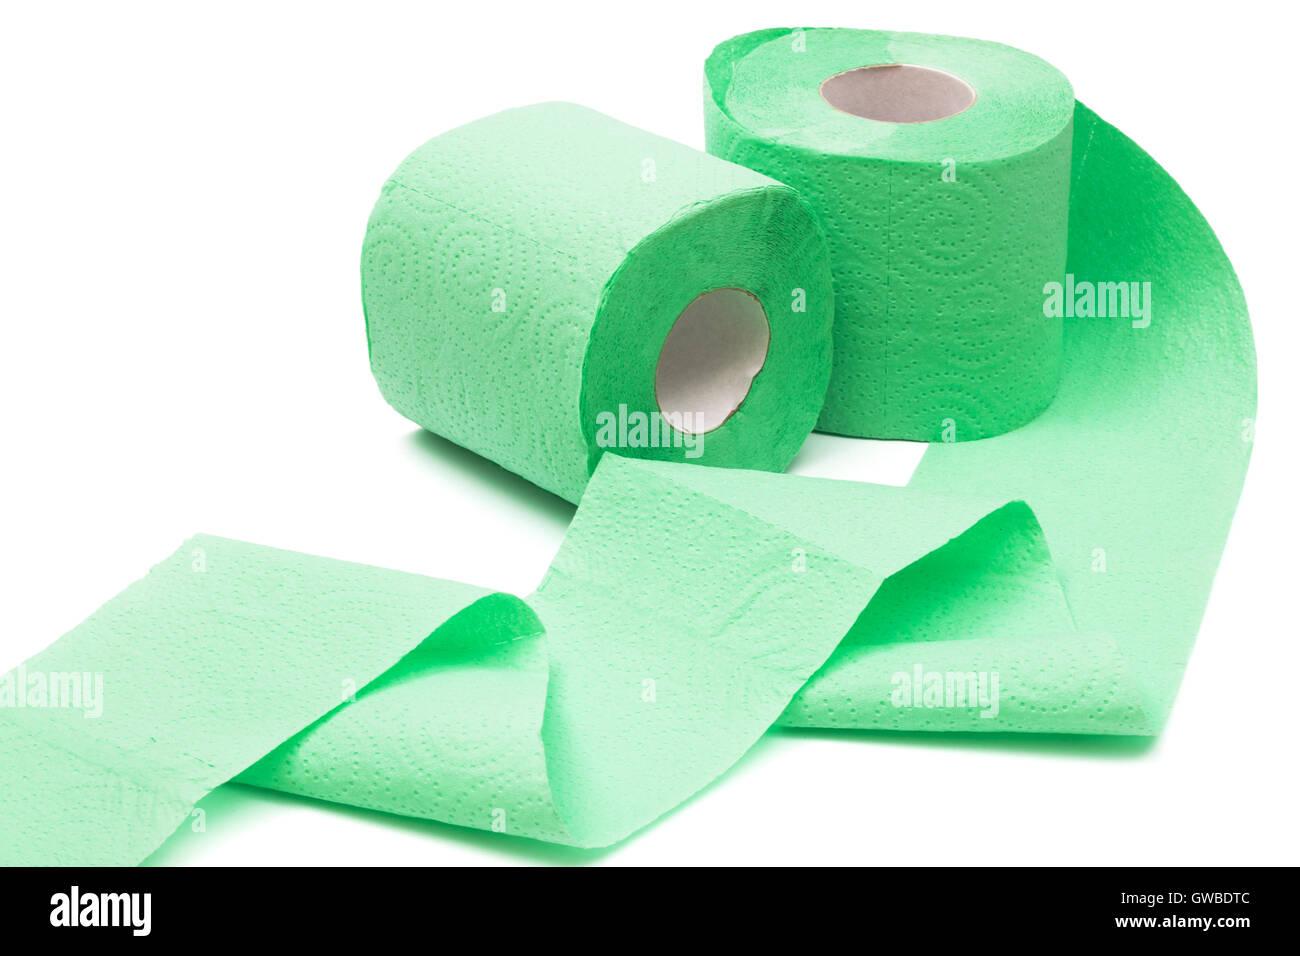 Toilet Paper Stock Photos Toilet Paper Stock Images Alamy